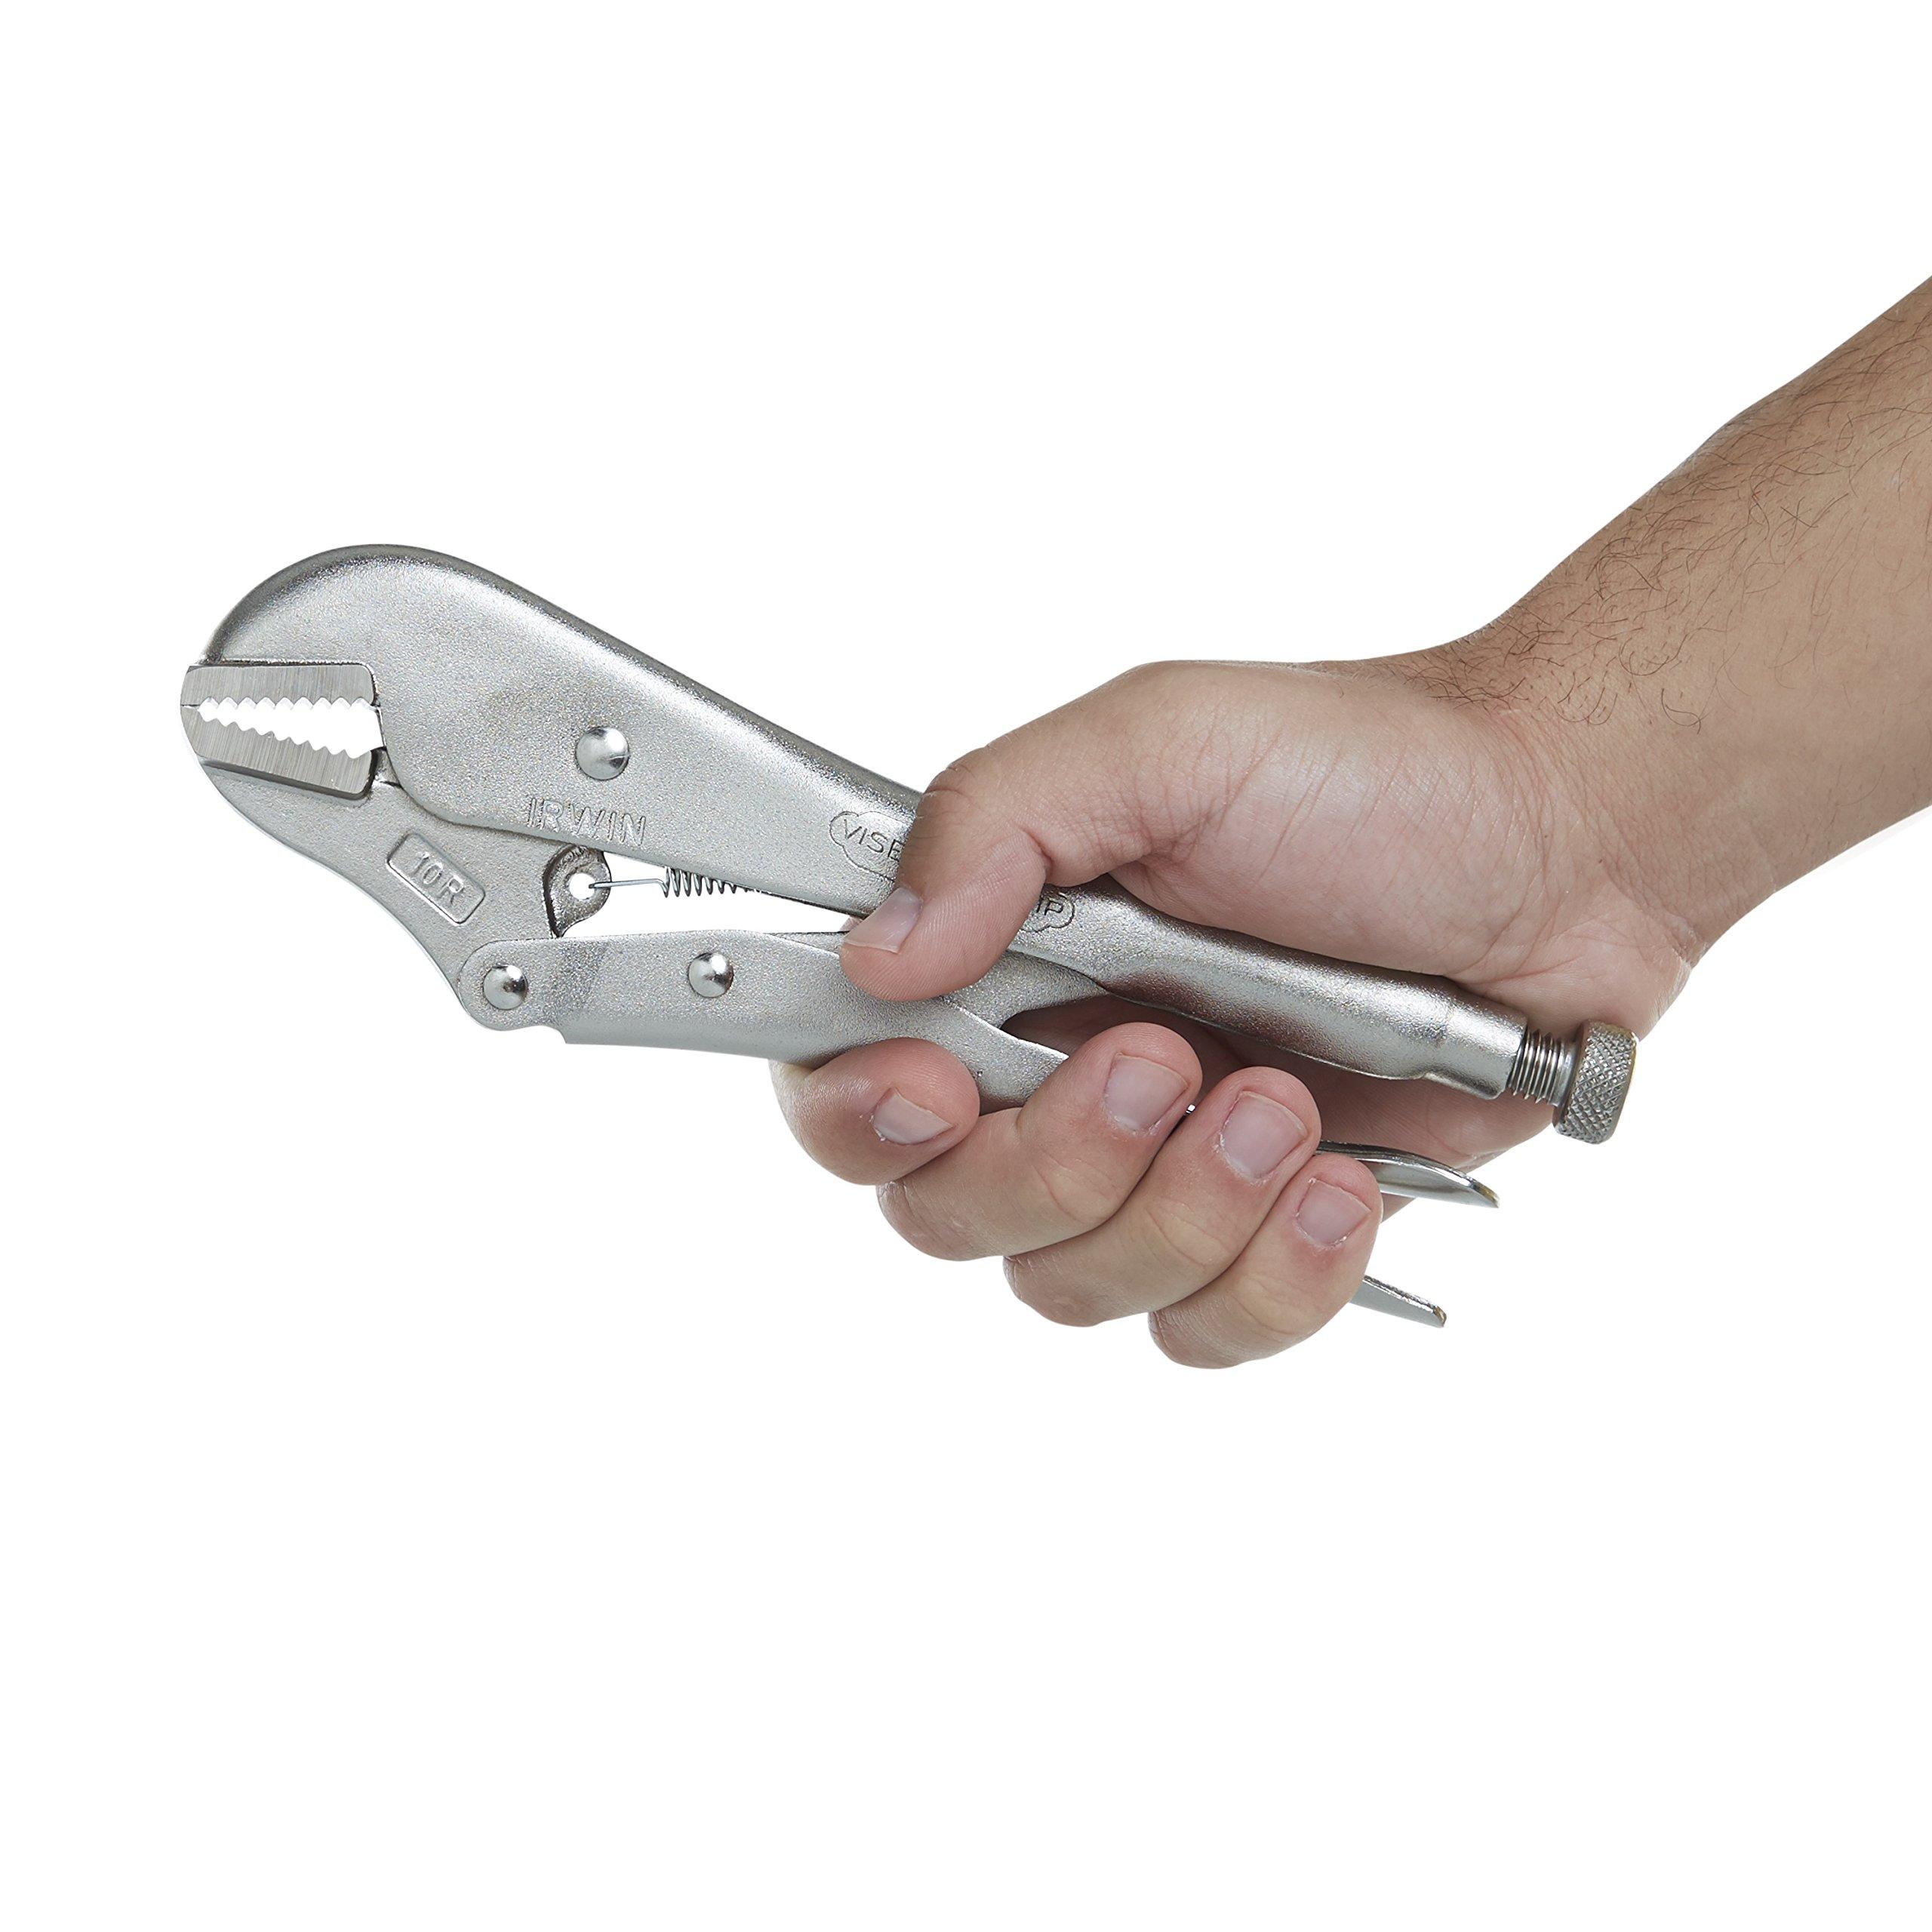 IRWIN Tools VISE-GRIP Locking Pliers, Original, Straight Jaw, 10-inch (102L3) by Irwin Tools (Image #3)